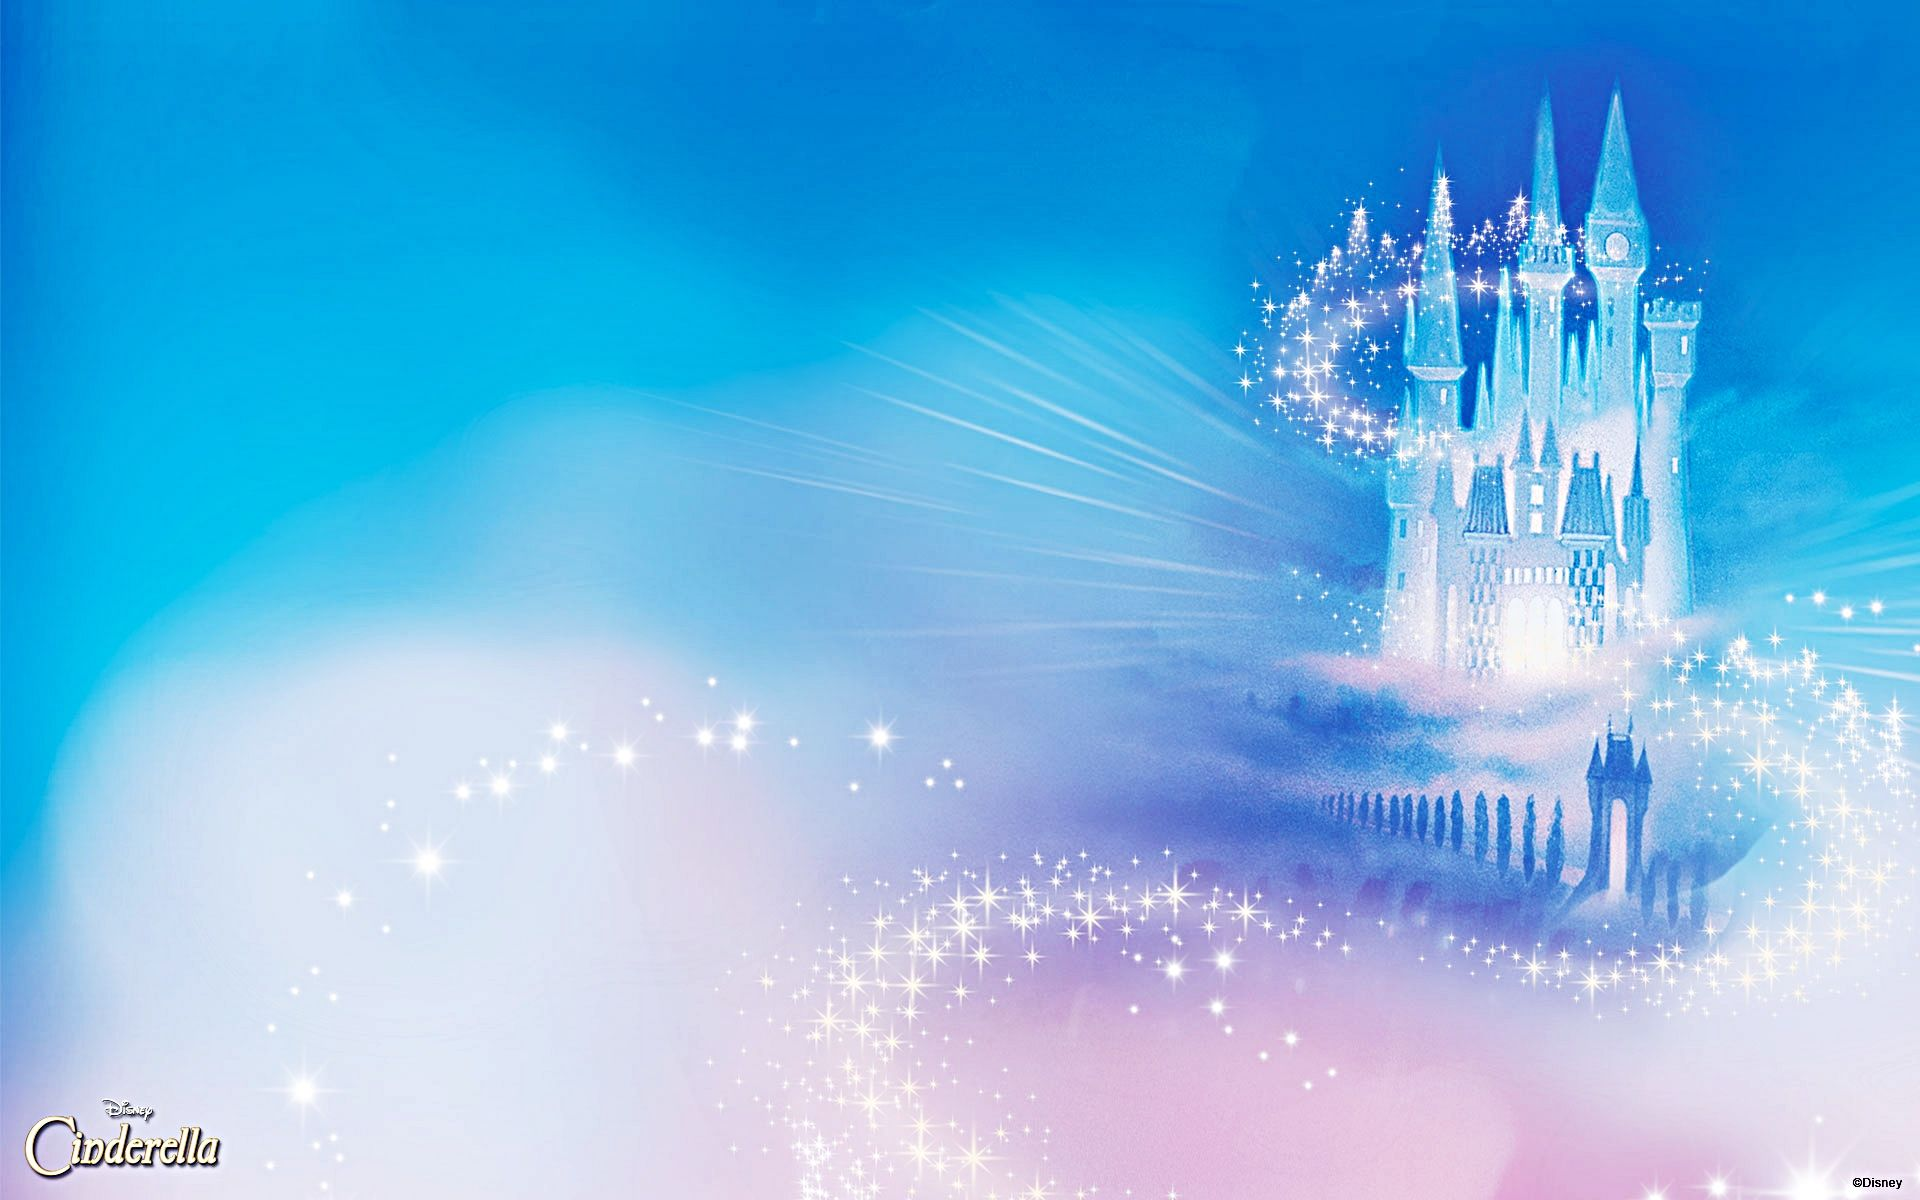 Walt Disney Characters Wallpaper Walt Disney Wallpapers Cinderella Cinderella Wallpaper Disney Princess Wallpaper Cinderella Background